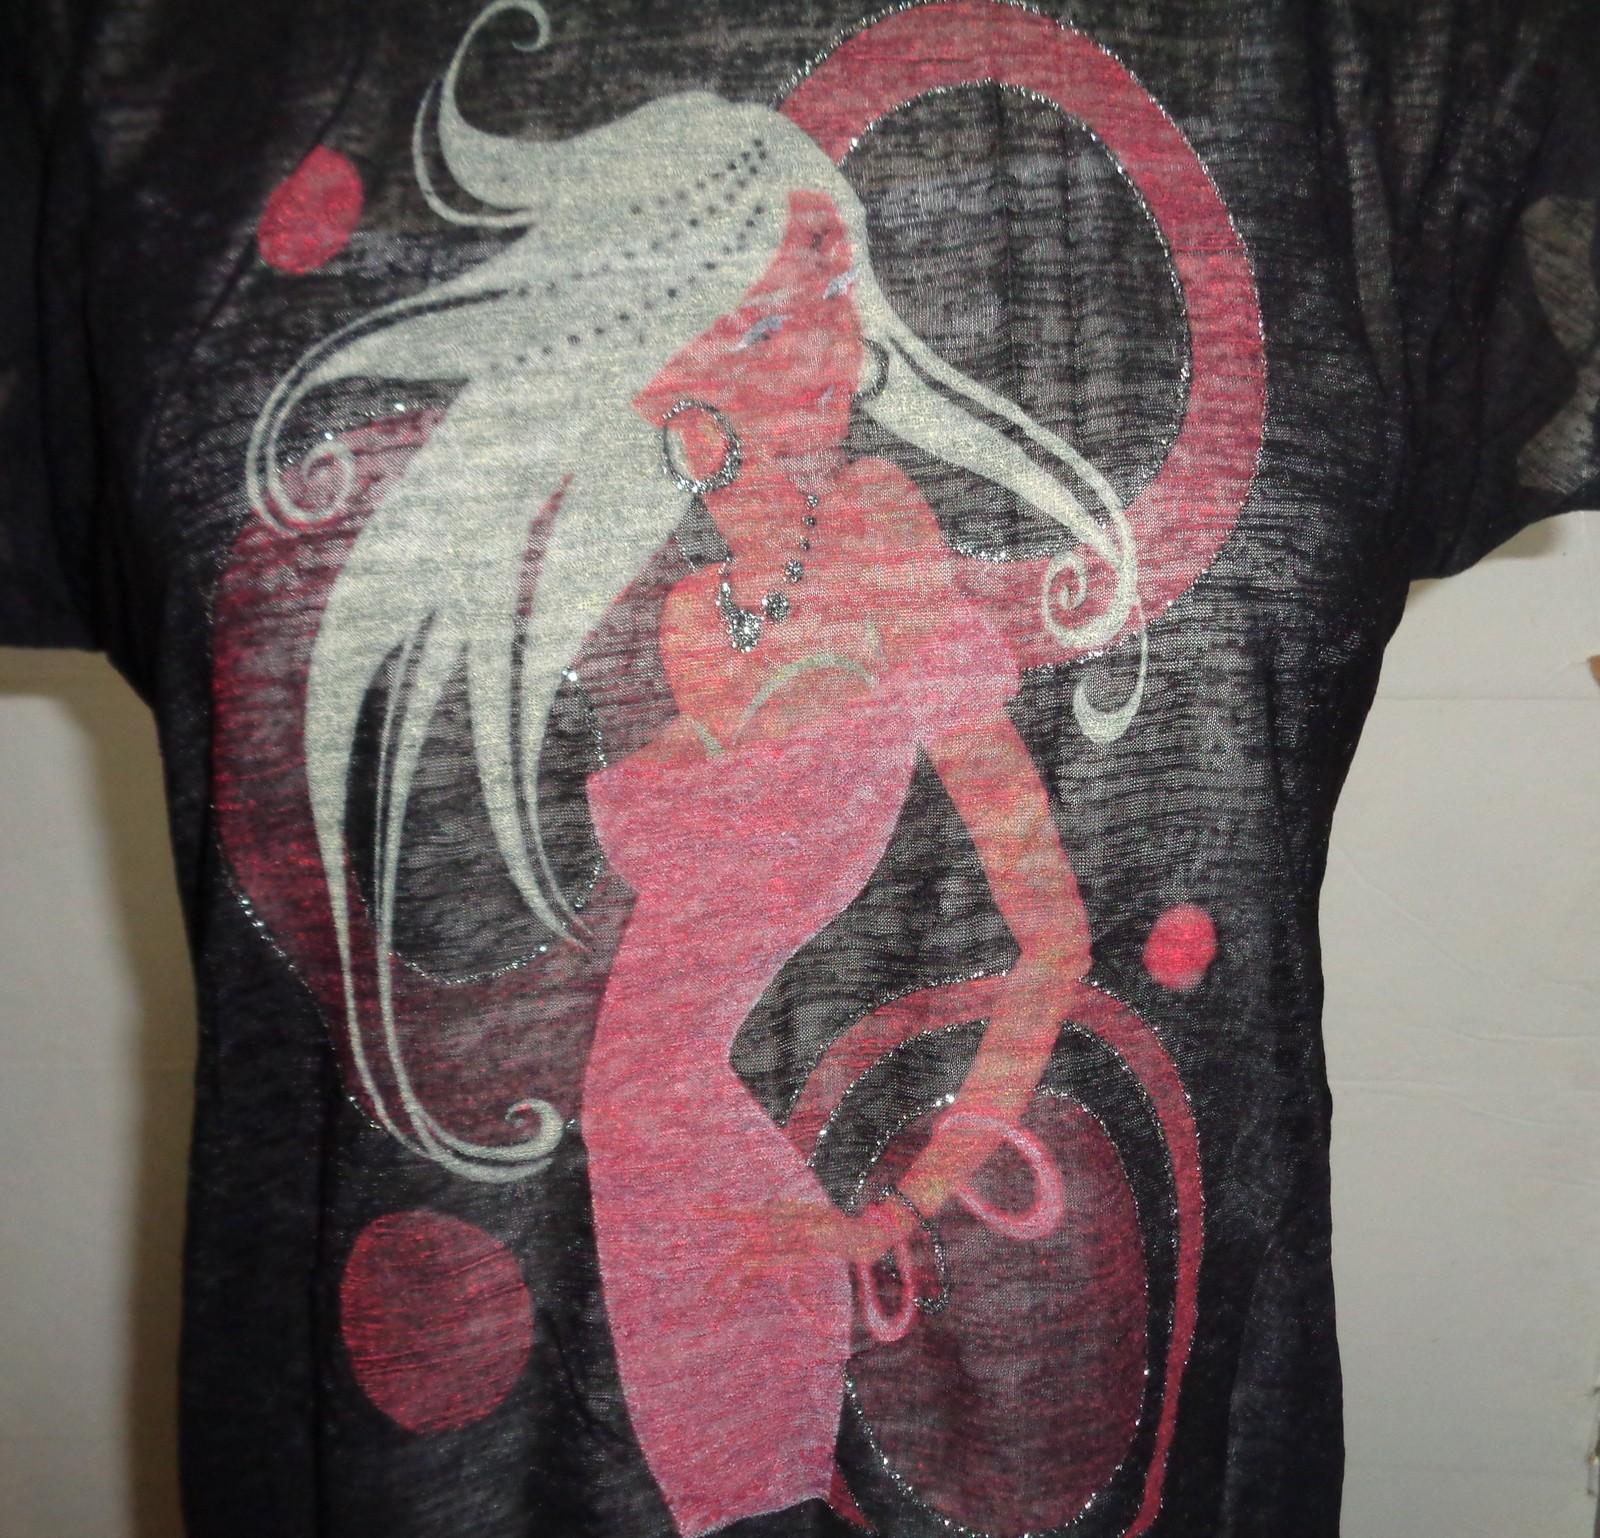 Uptown Girl Two Piece T-Shirt Tank & Sheer Over NWT Women's SZ Medium Black